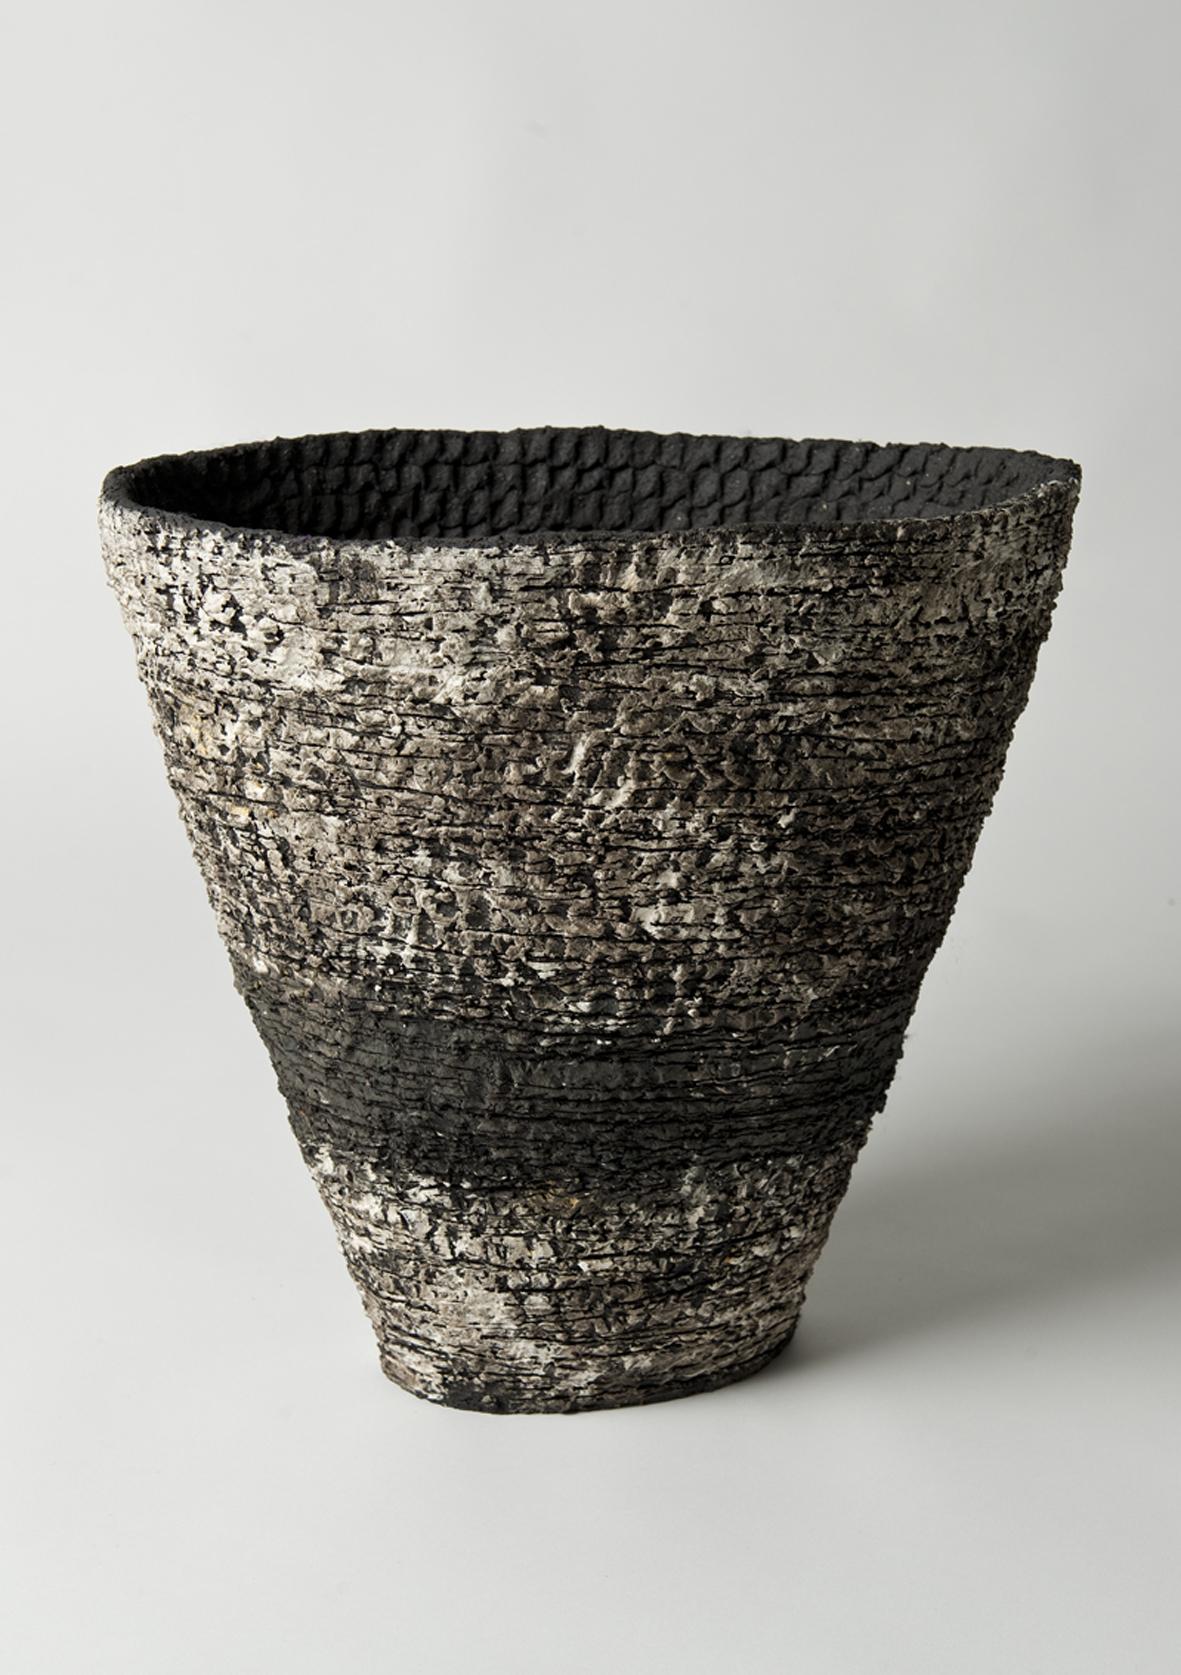 28. 2020 Sarah Purvey Landscape Series- Black and White 39cm H x 41cm W x 31 cm D 2012 £695.00.jpg